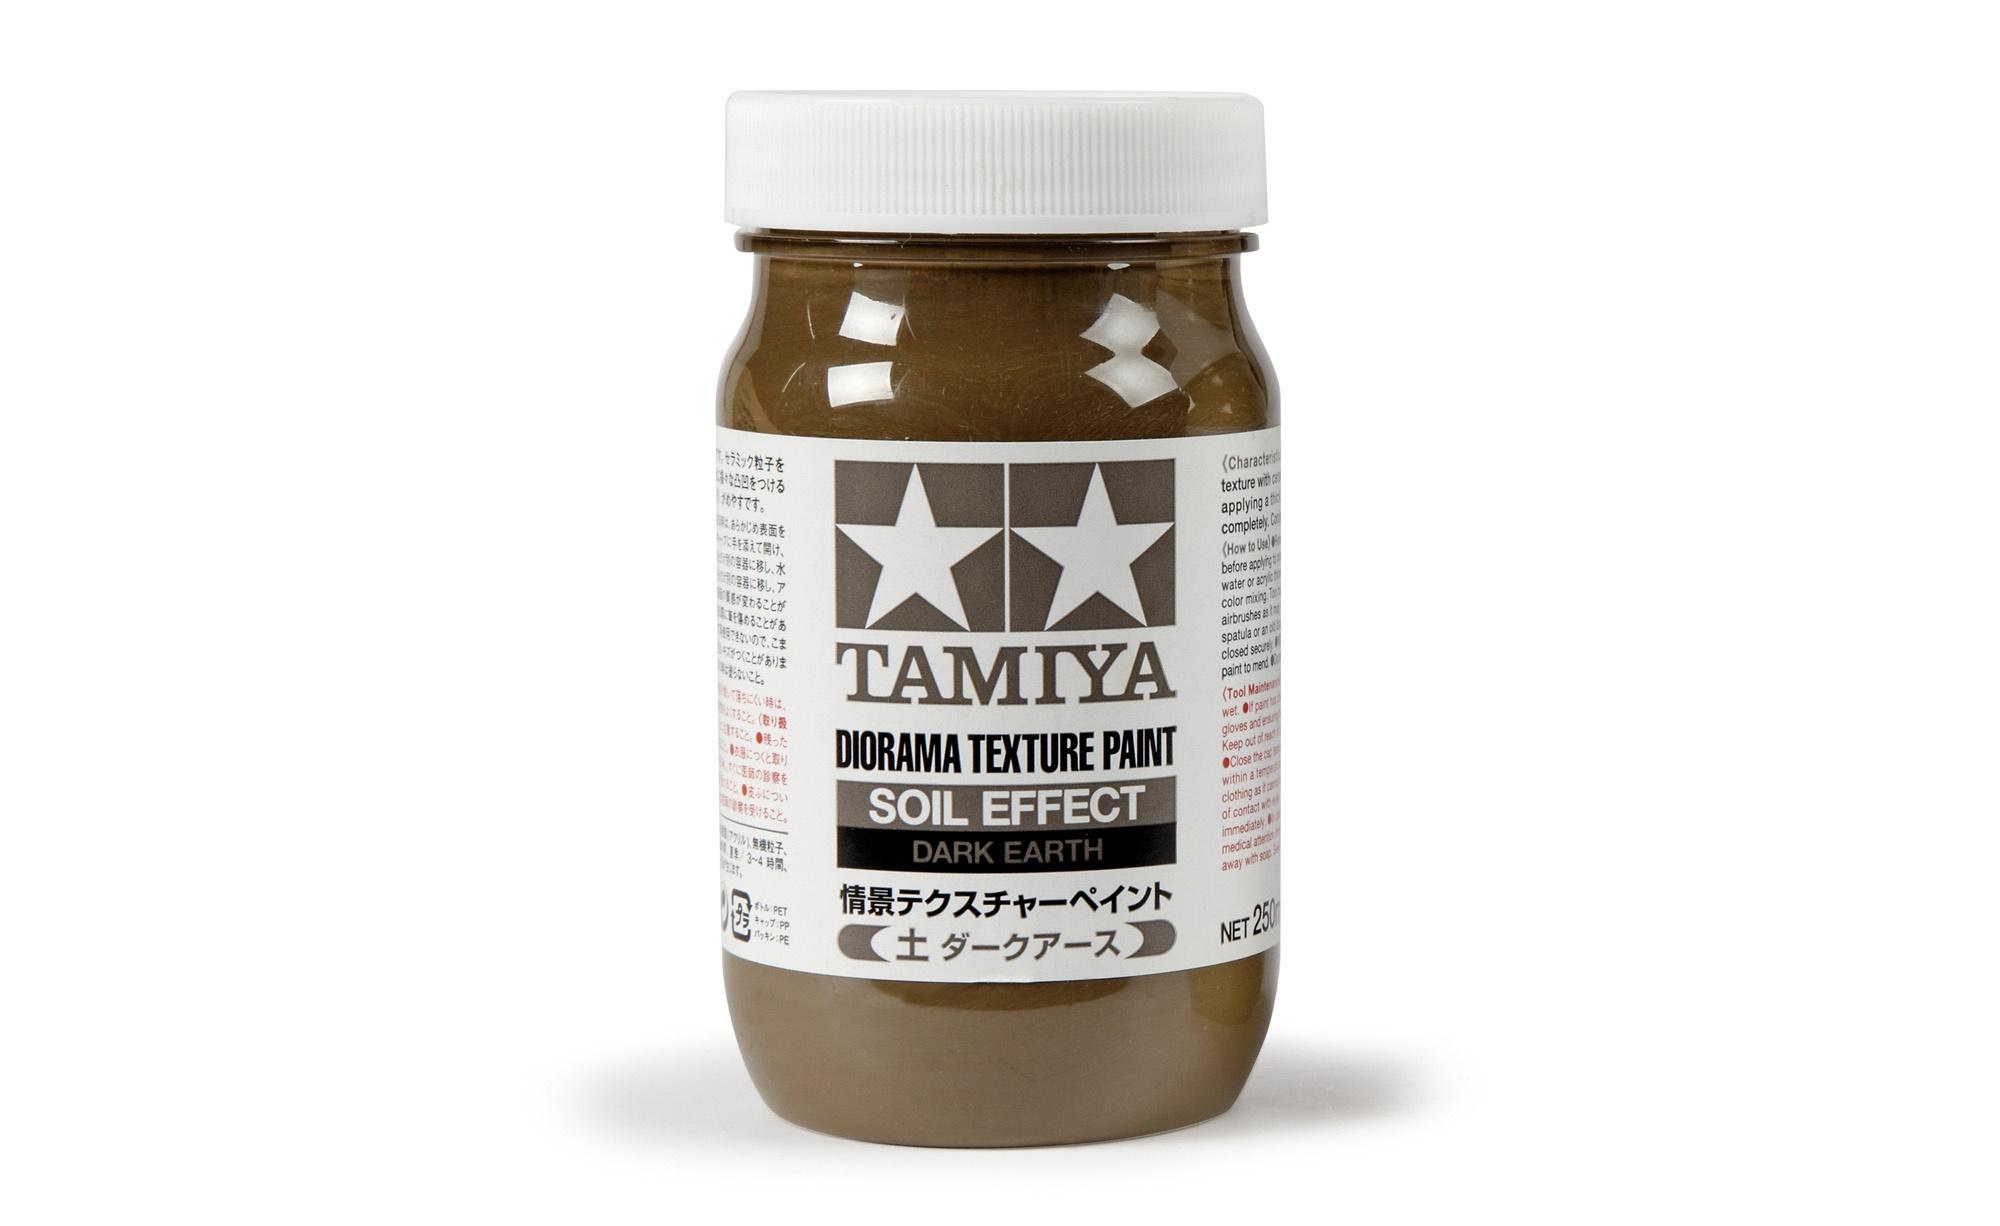 Tamiya Diorama Texture Paint - Soil Effect, Dark Earth - 250ml - Tamiya - TAM87121